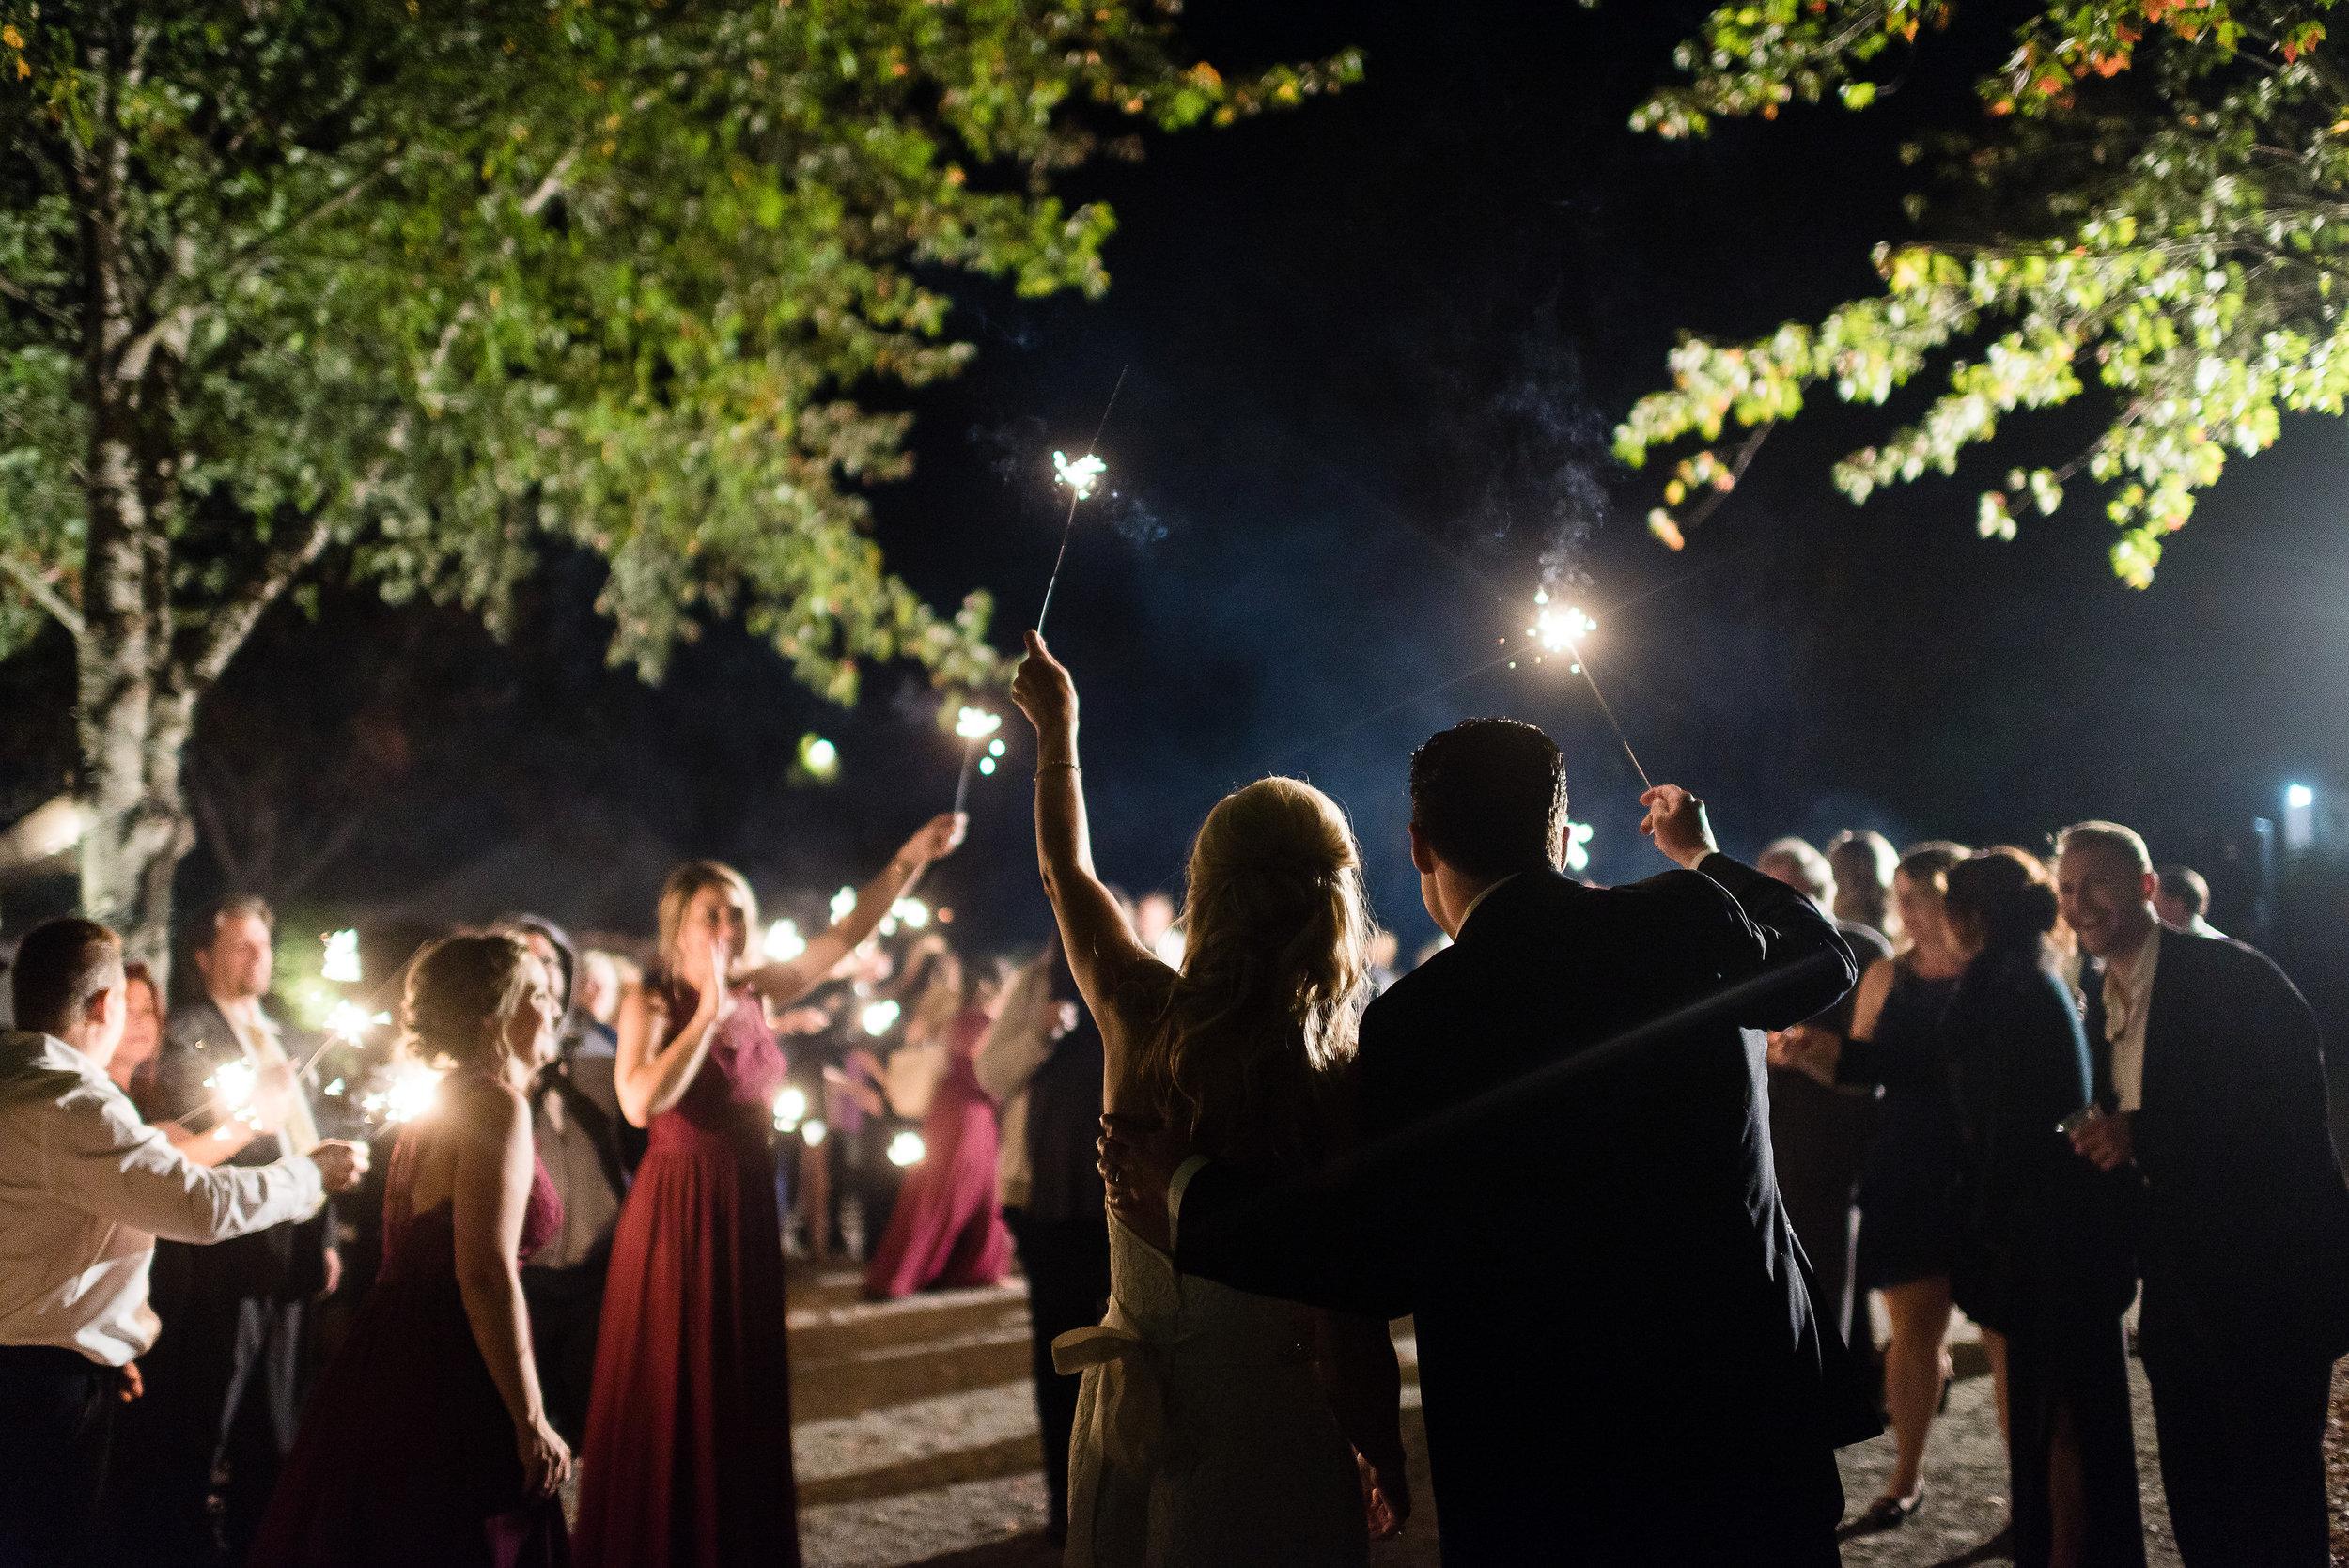 20161022_hawkesdene_fall_wedding_photos_2249.jpg